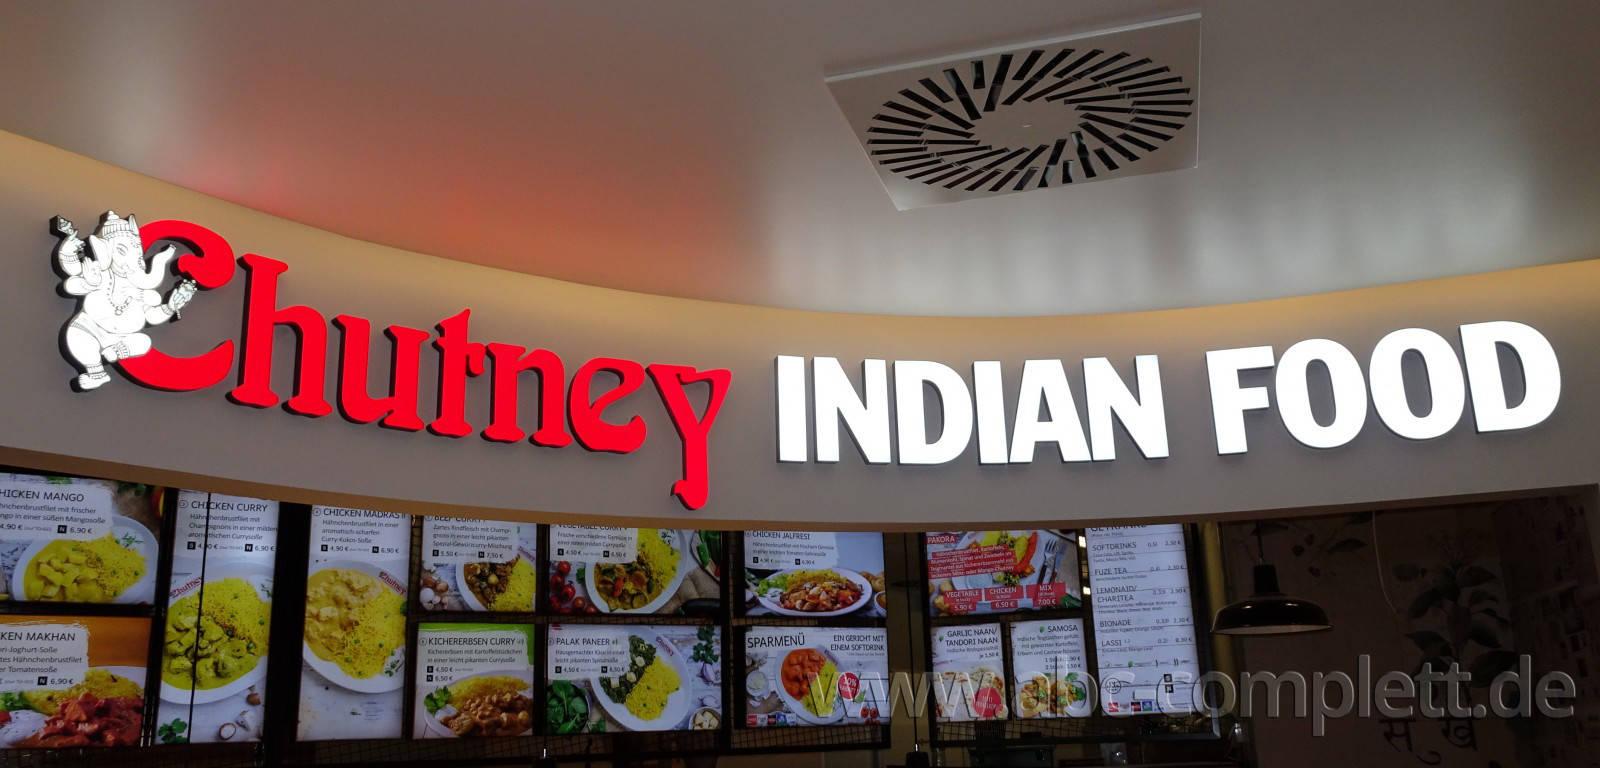 Ansicht des Geschäfts: Chutney Indian Food, East Side Mall, Berlin / Friedrichshain, Foto 2